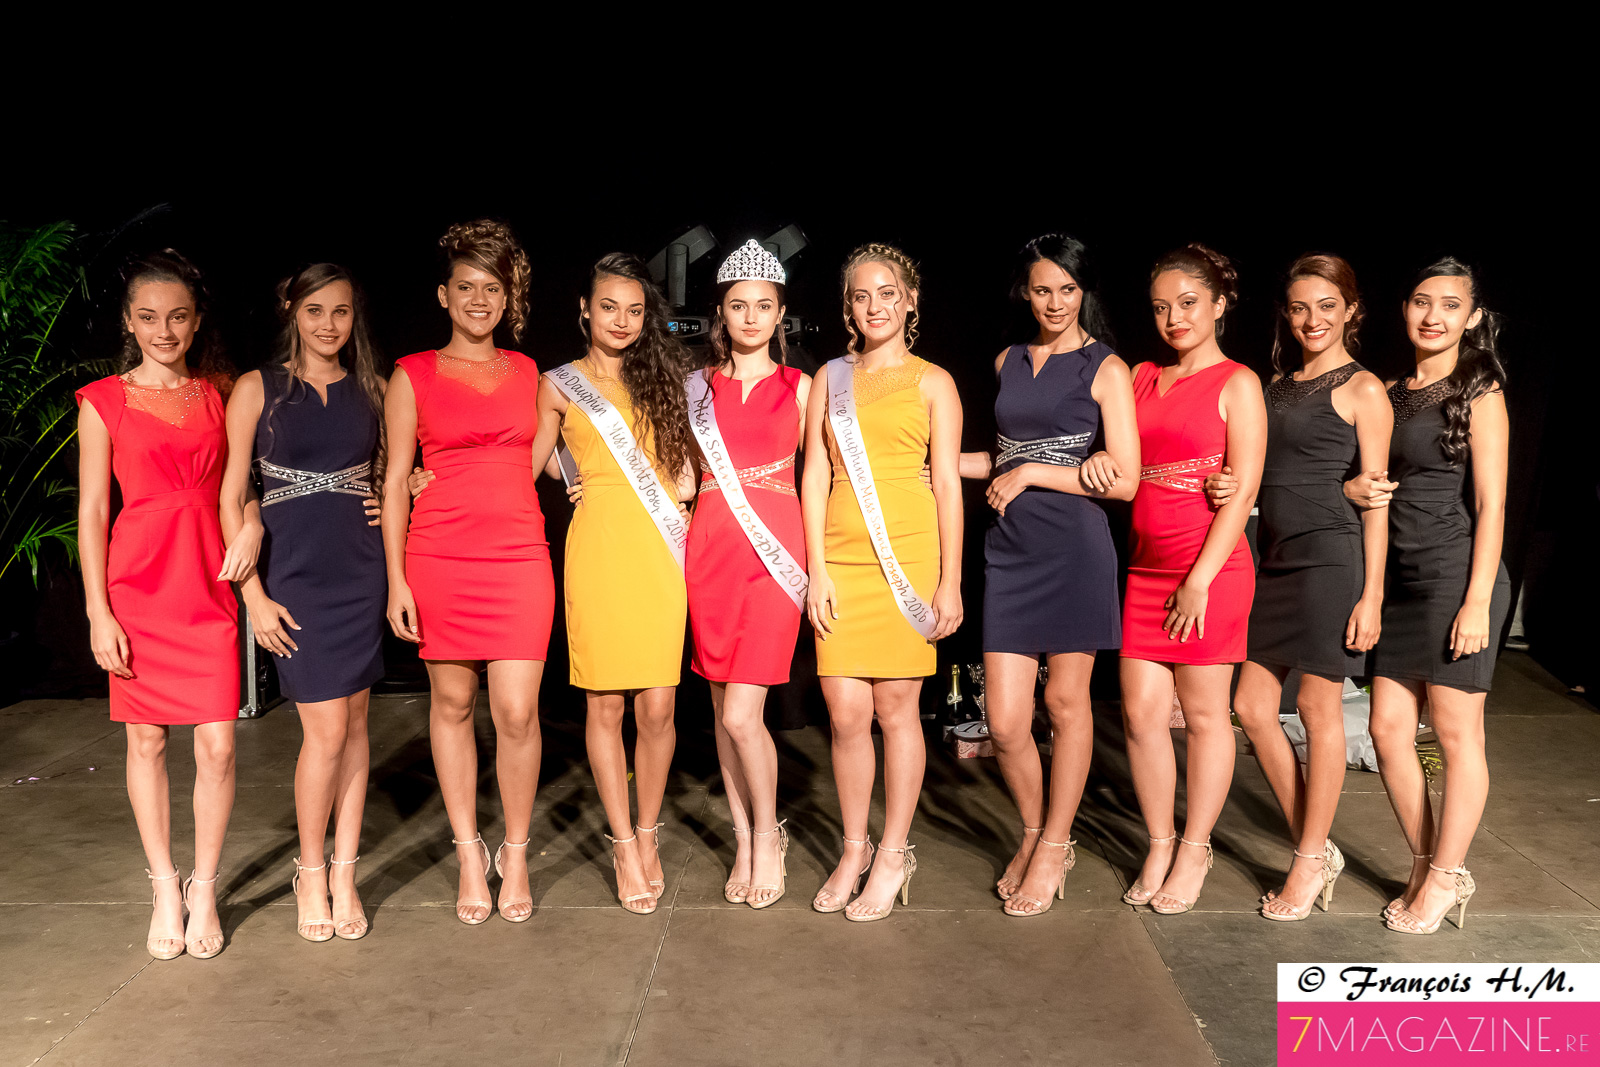 Les 10 candidates Miss Saint-Joseph 2016